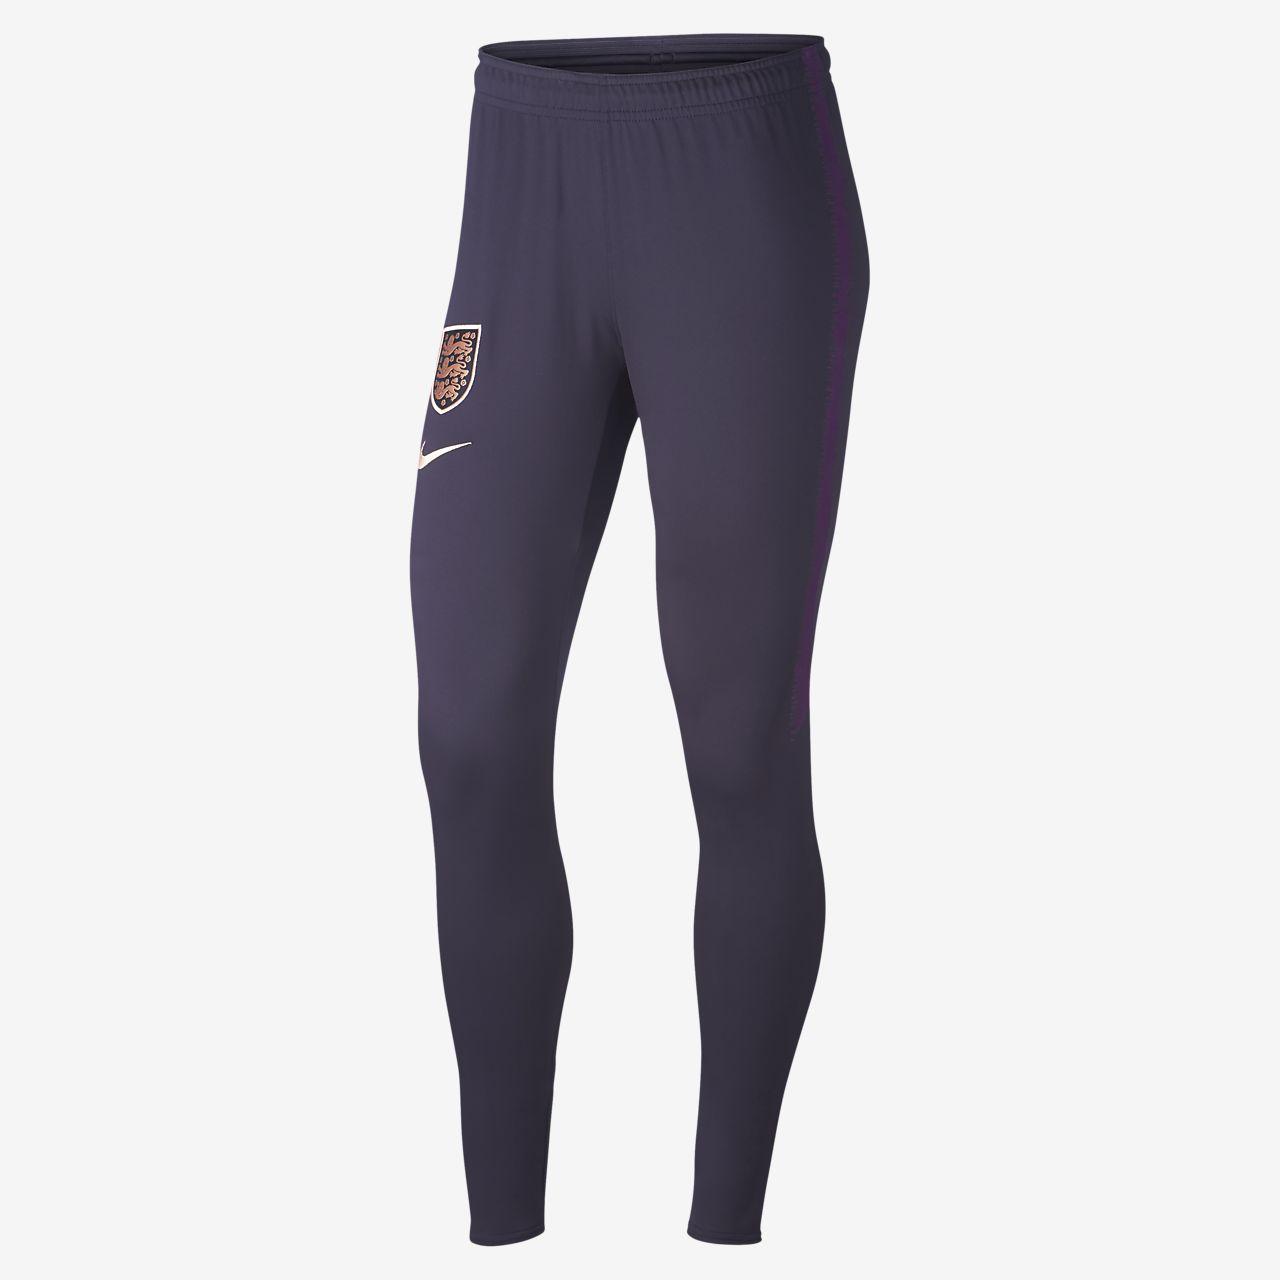 England Squad Women's Football Pants